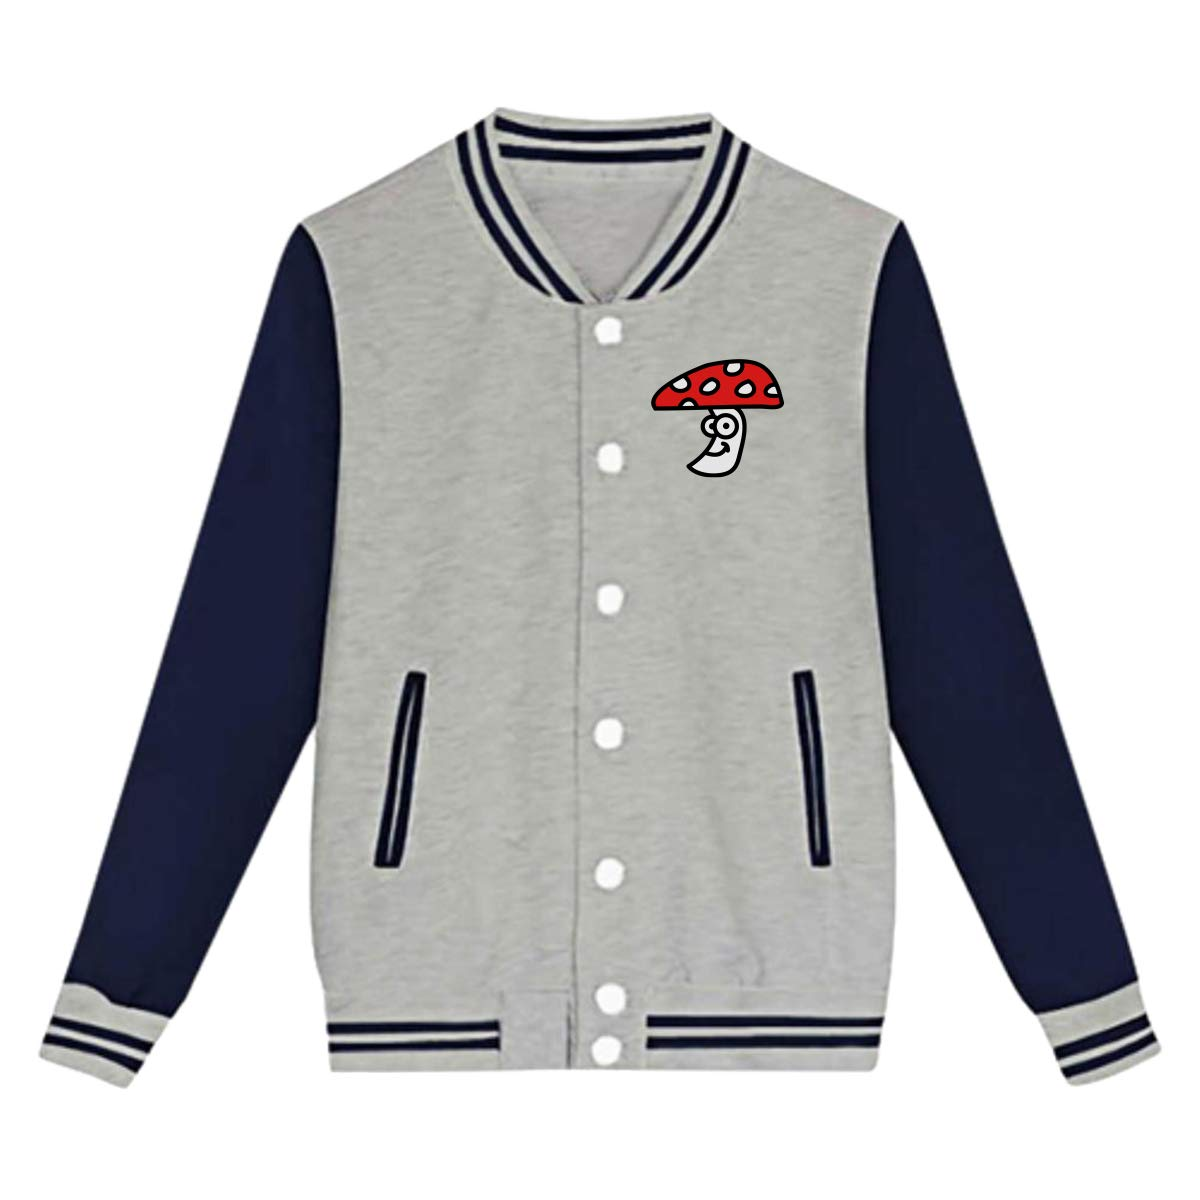 Cute Red Mushroom Baseball Uniform Jacket Sports Coat for Teenagers Unisex